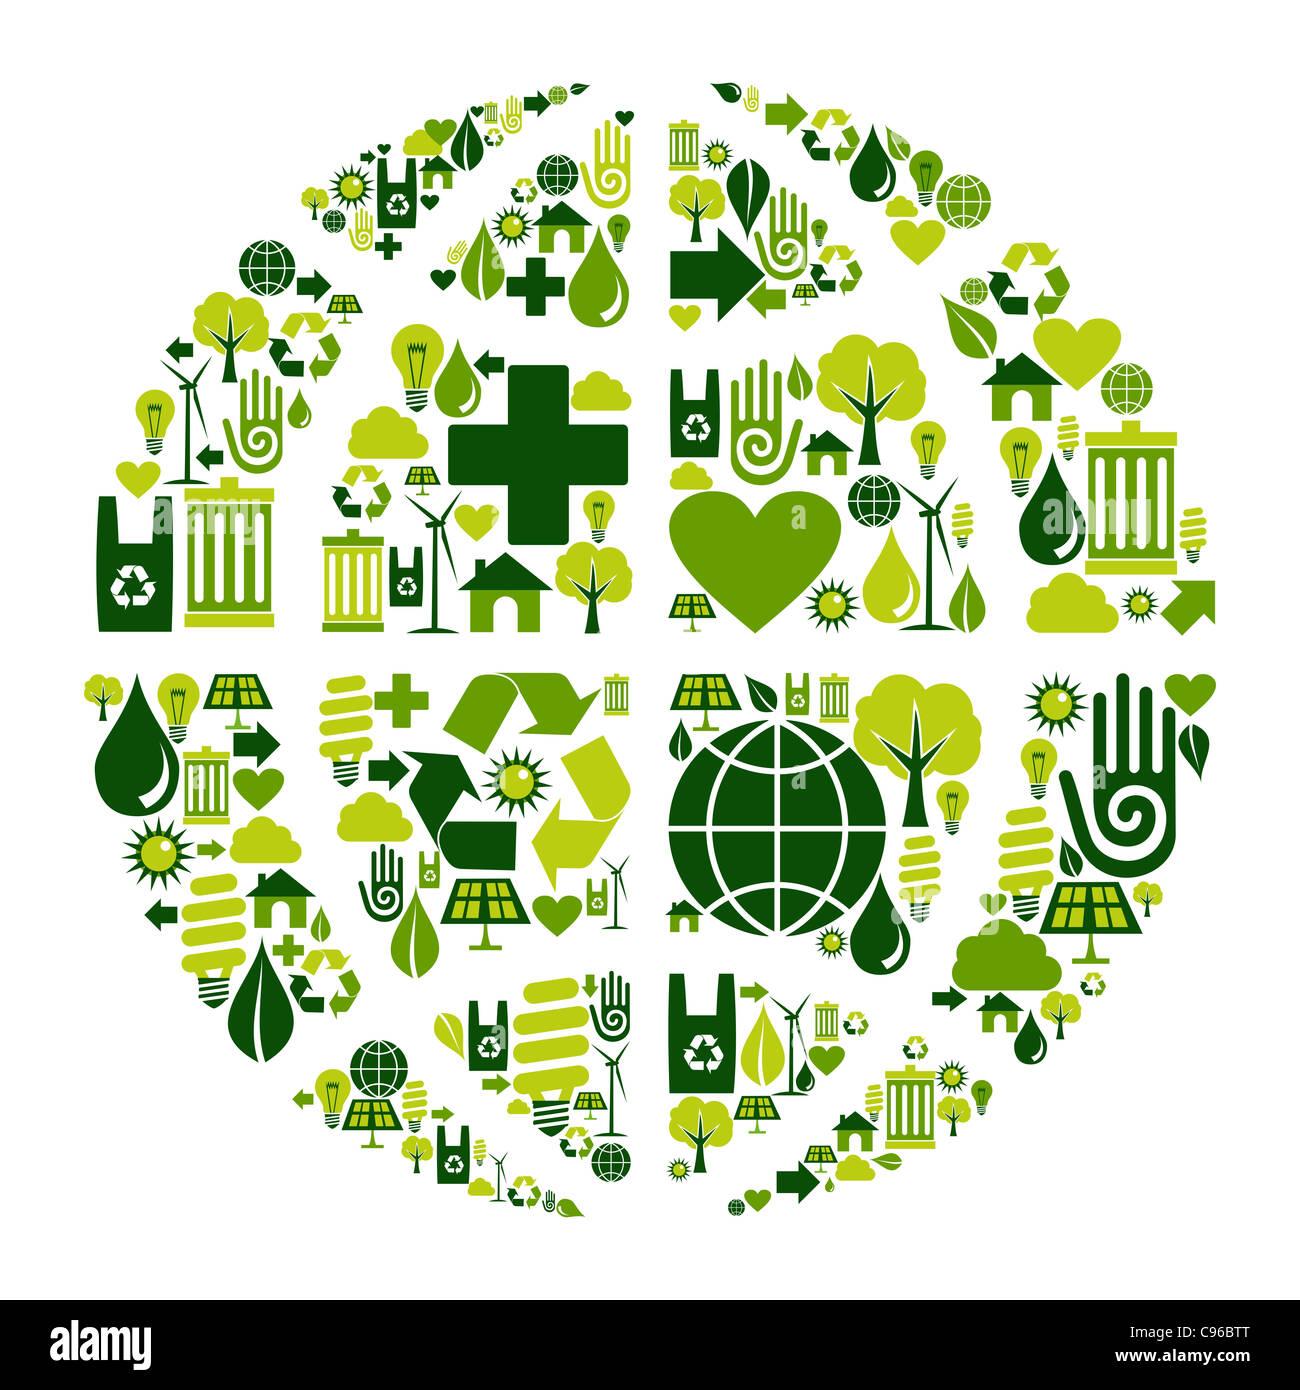 World symbol social media with environmental icons. - Stock Image